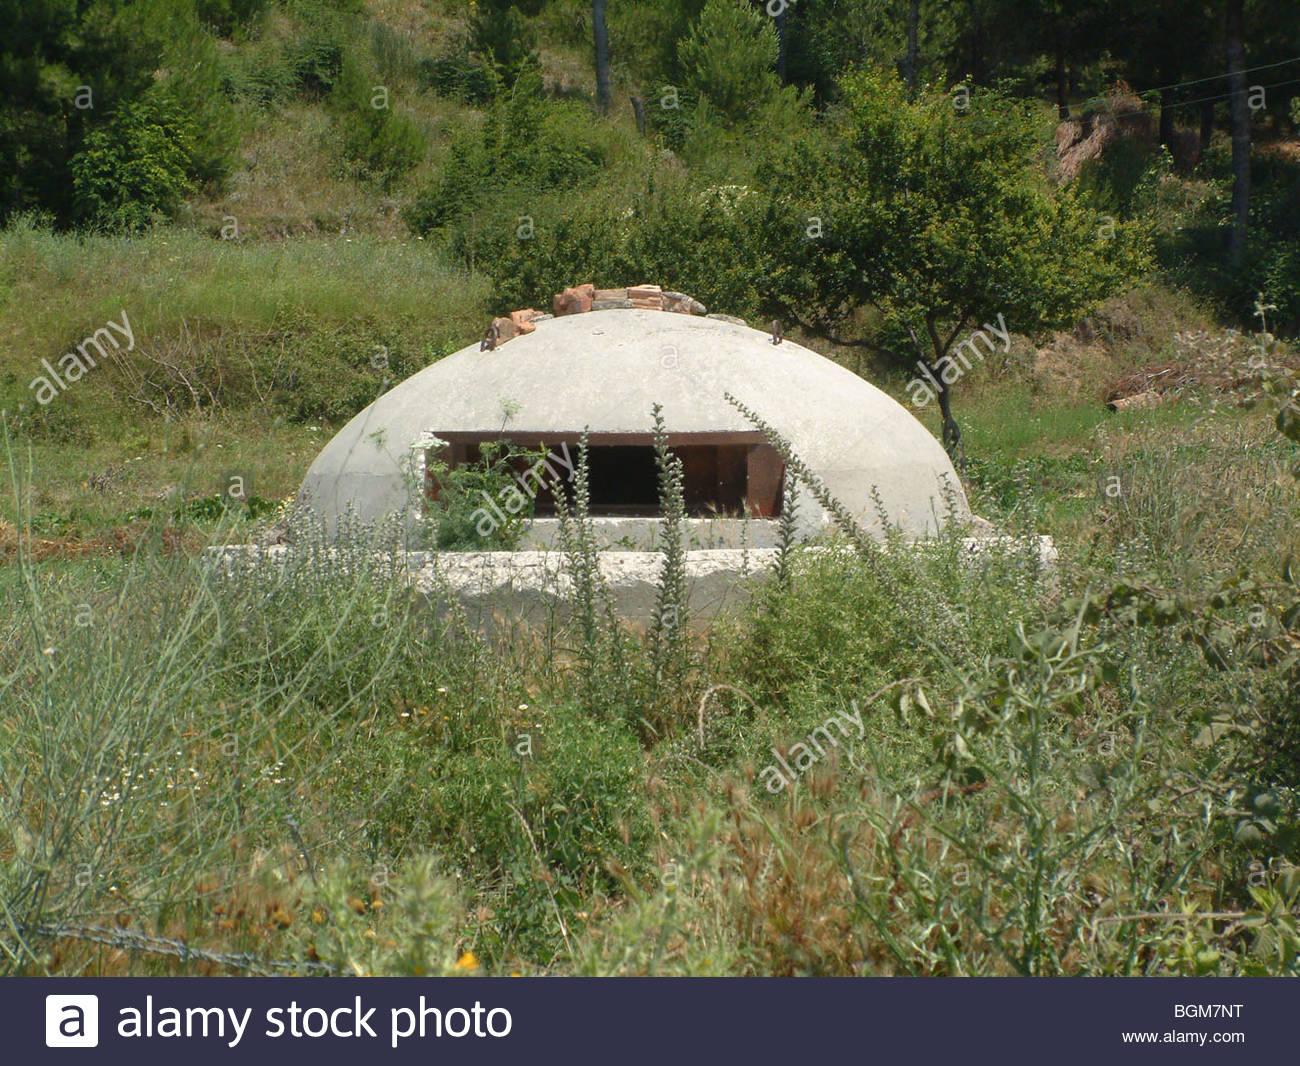 Albania bunker - Stock Image